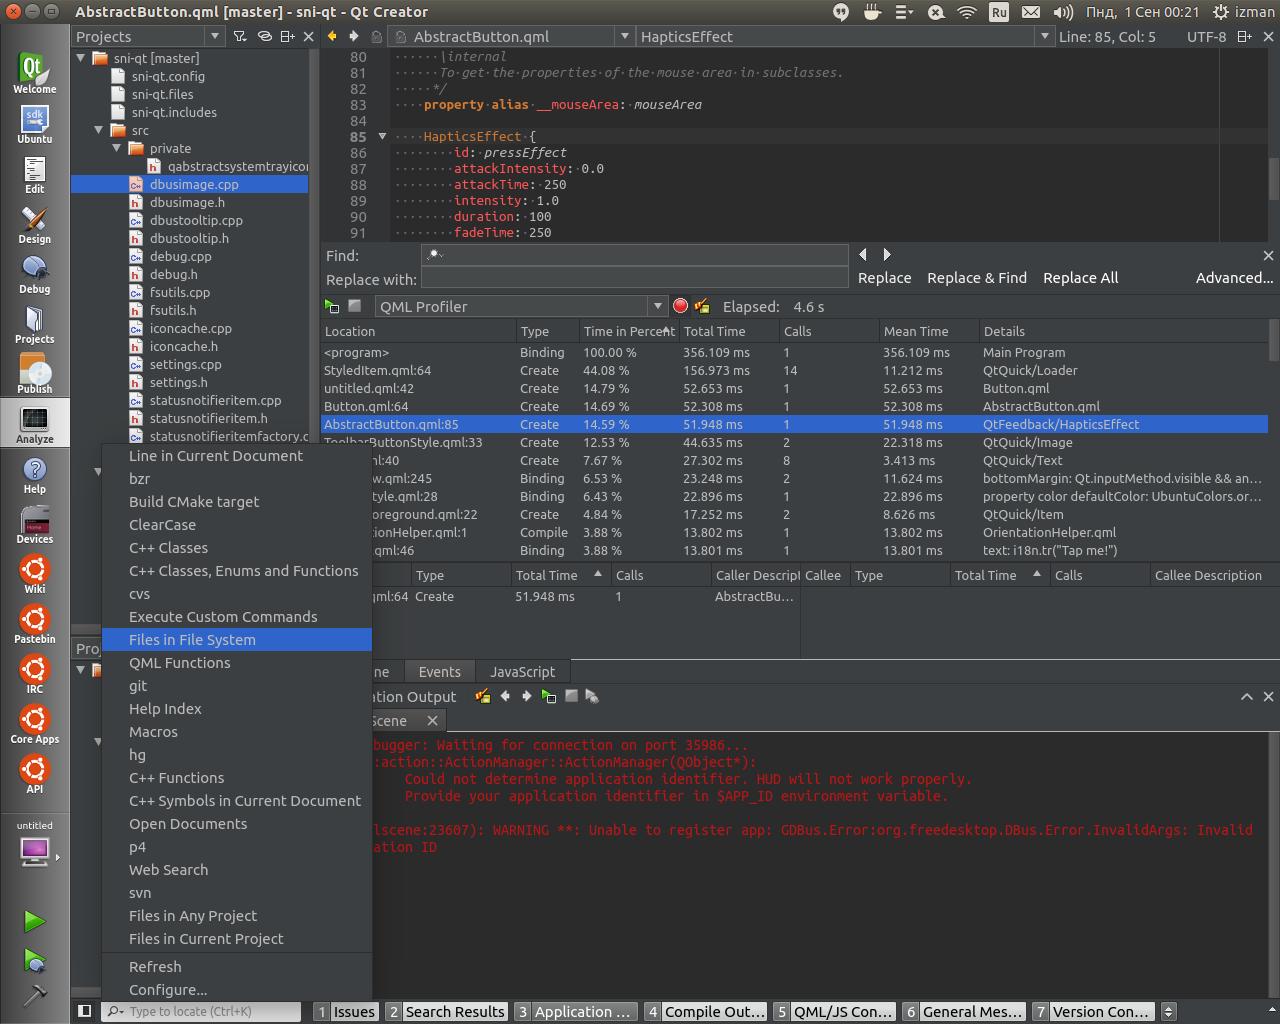 Background image qt stylesheet - Options Dialog Screenshot Analyze Screenshot